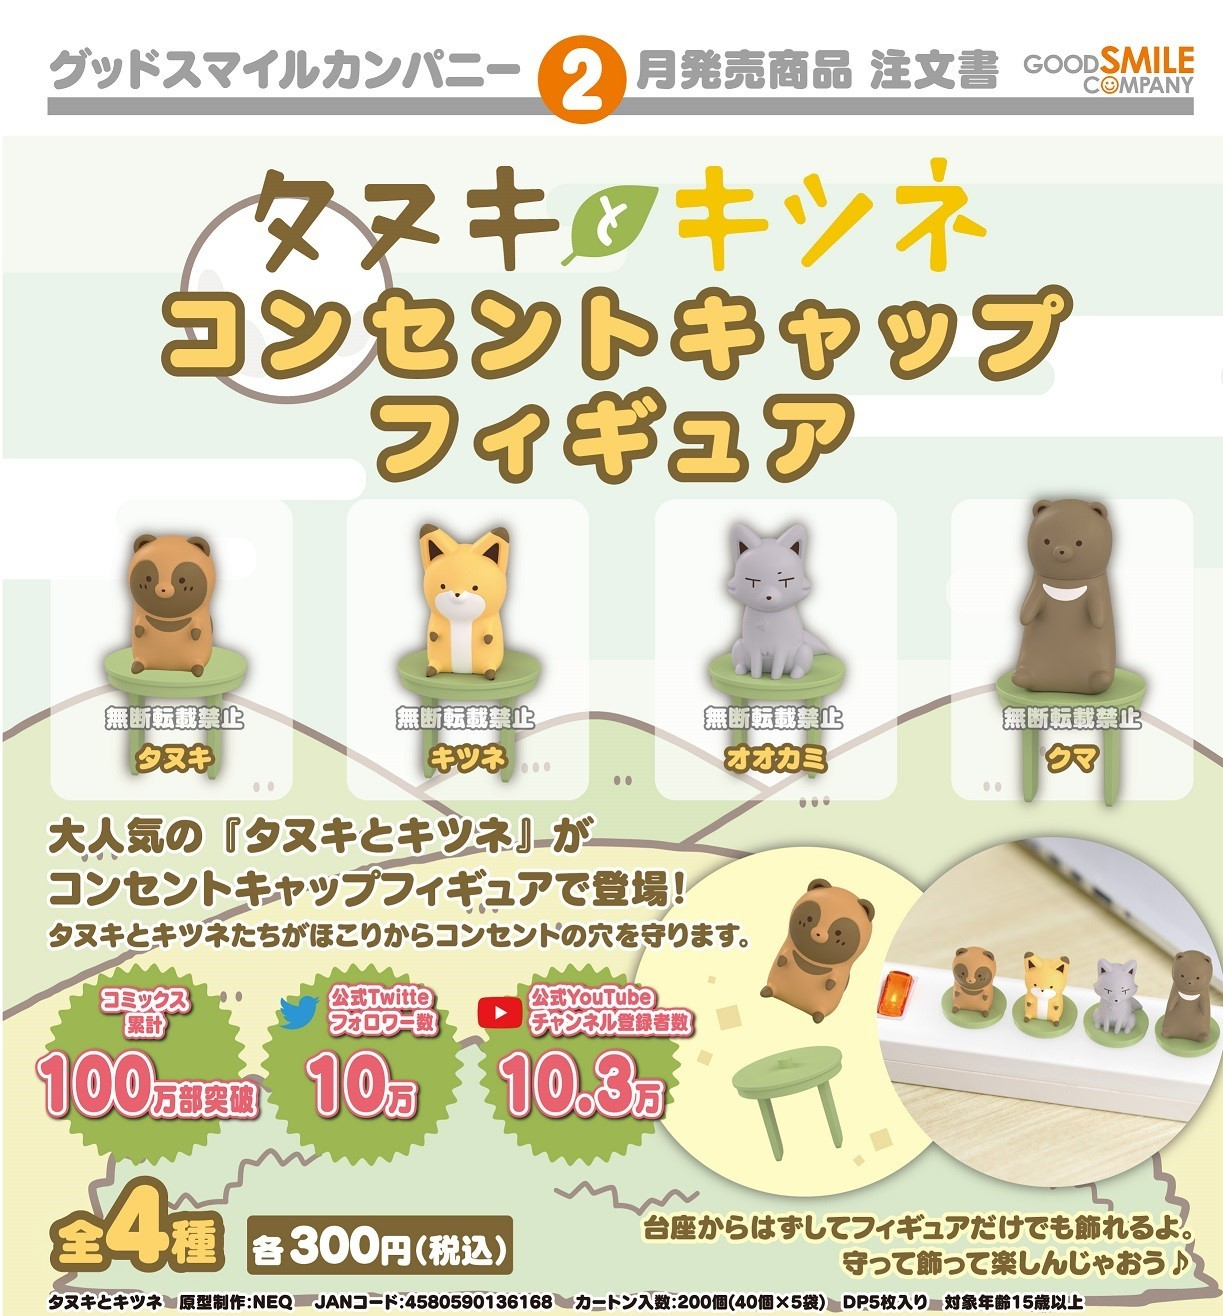 Order Form Tanuki & Kitsune Outlet Cover Figures (1).jpg